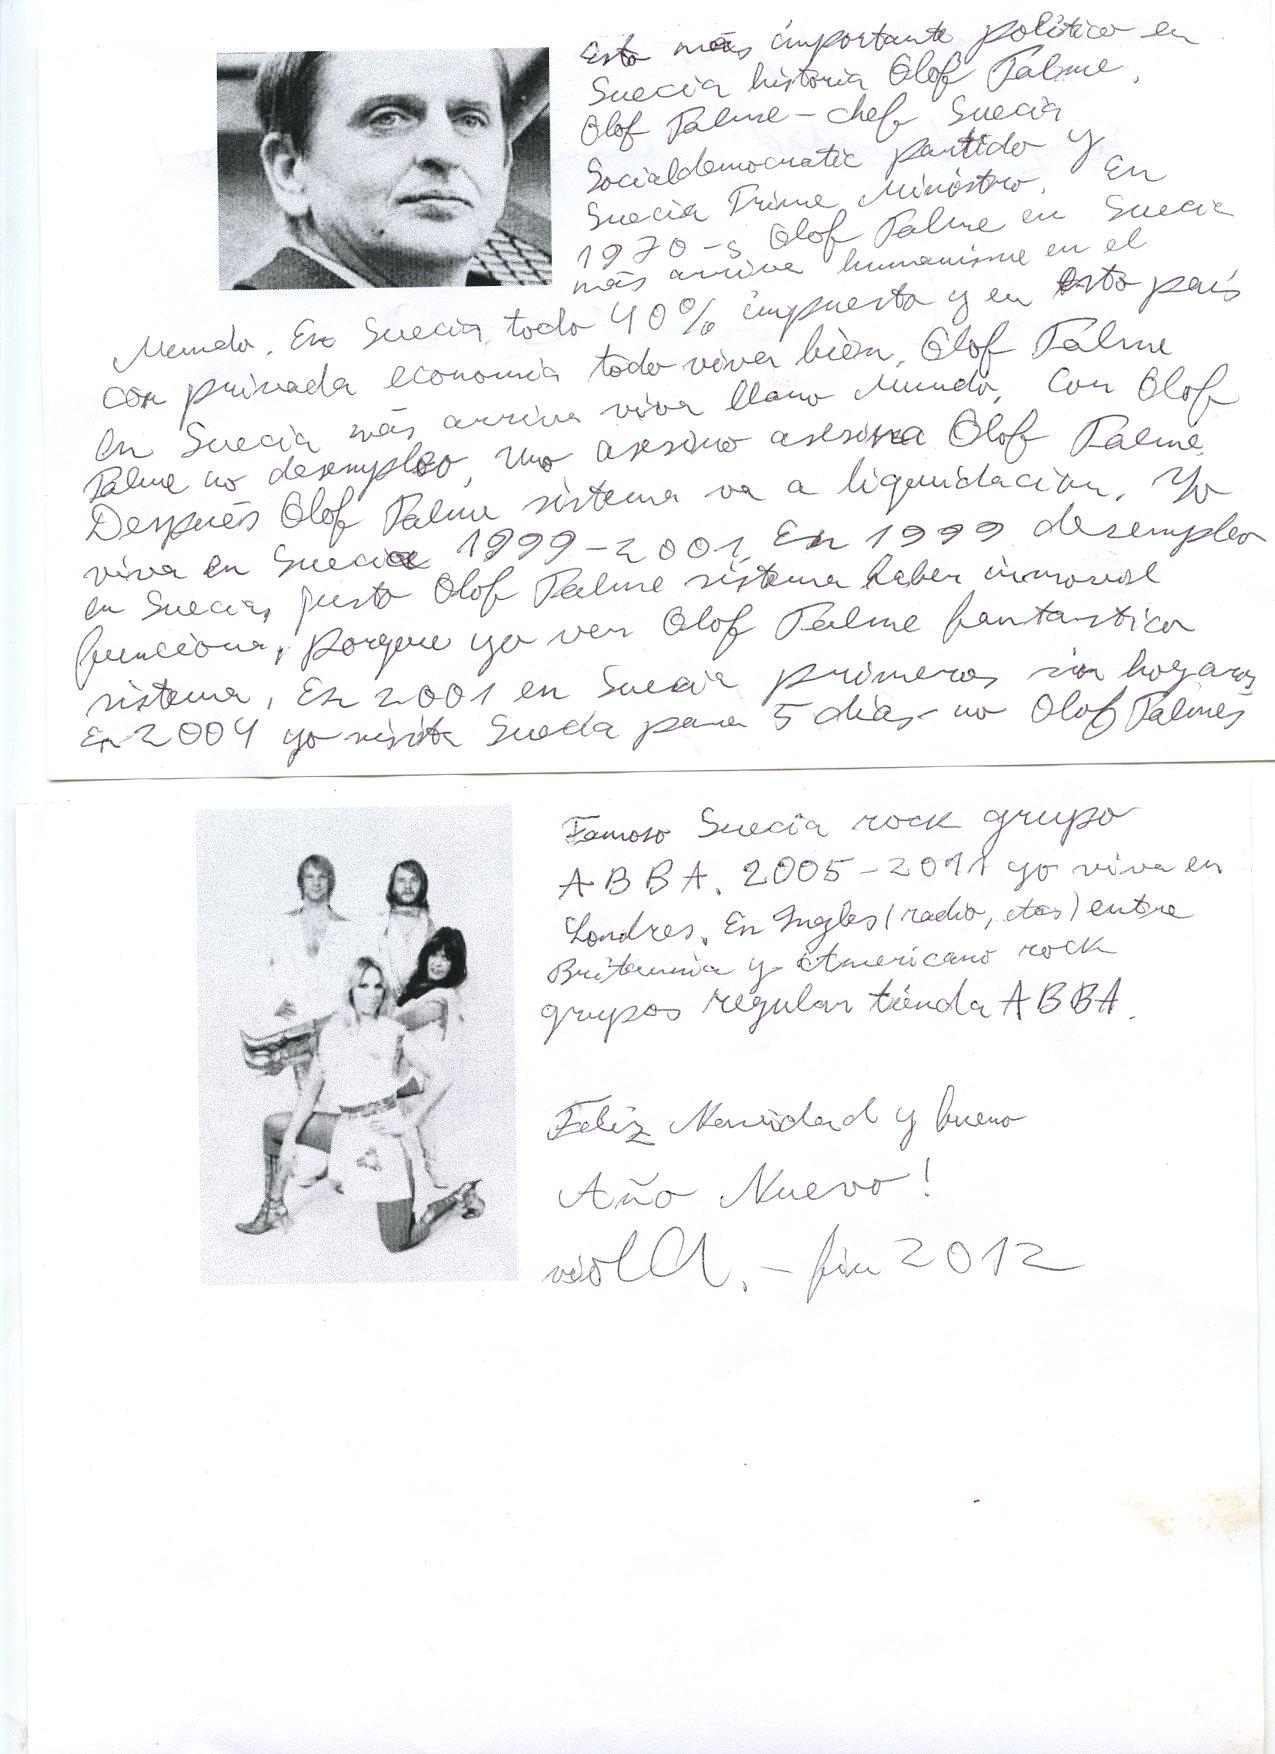 Pintura Acrílica sobre lino, 115x 115 cm12 hojas A4 con textos e imágenes realizadas por Viola Saulitre∙ Video .mov 720x576 duración 7'51 minutos